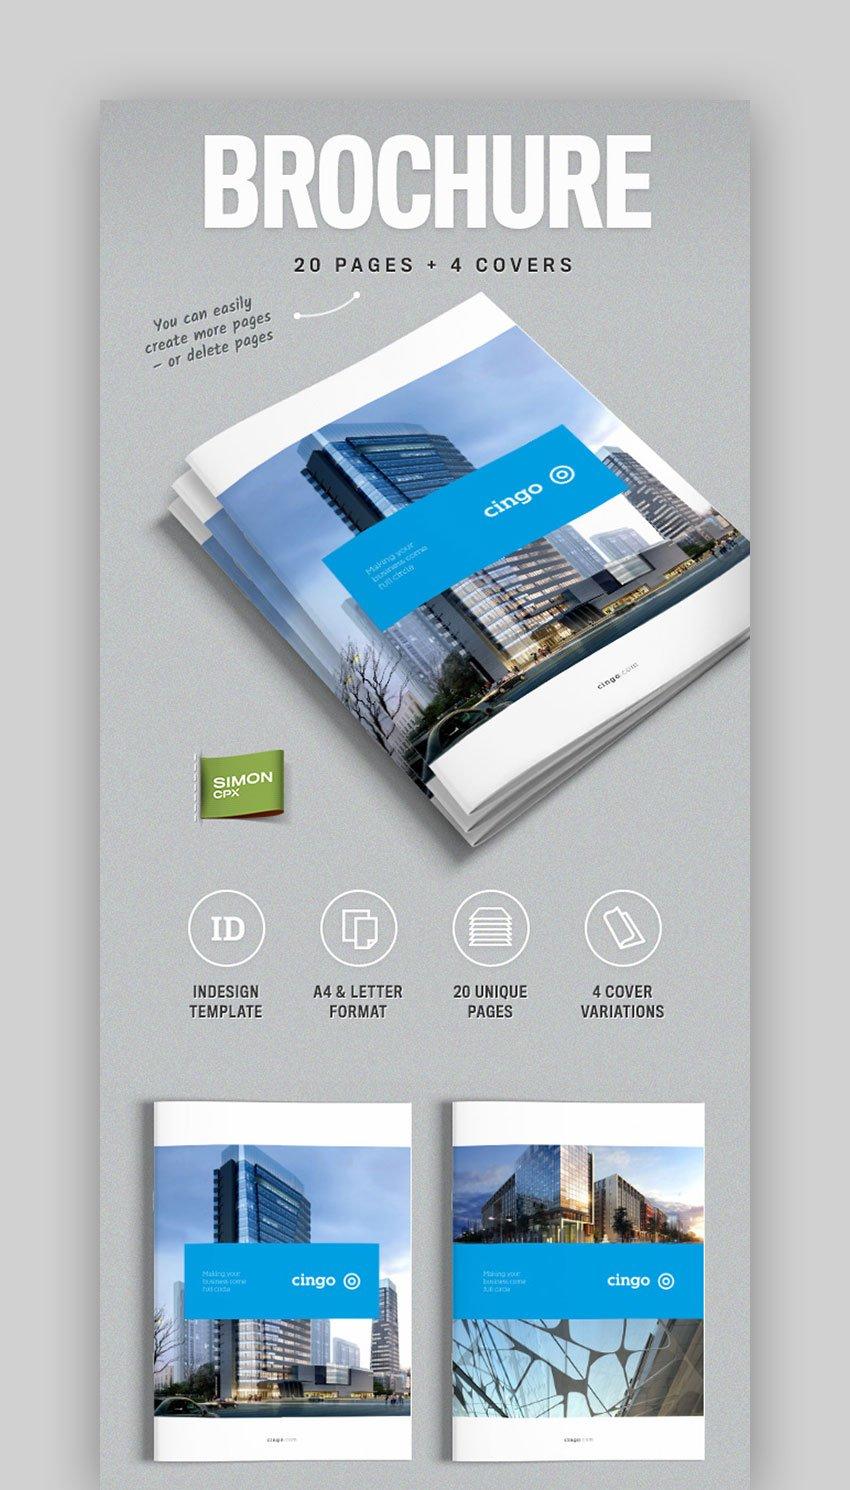 Brochure Template for InDesign  Cingo